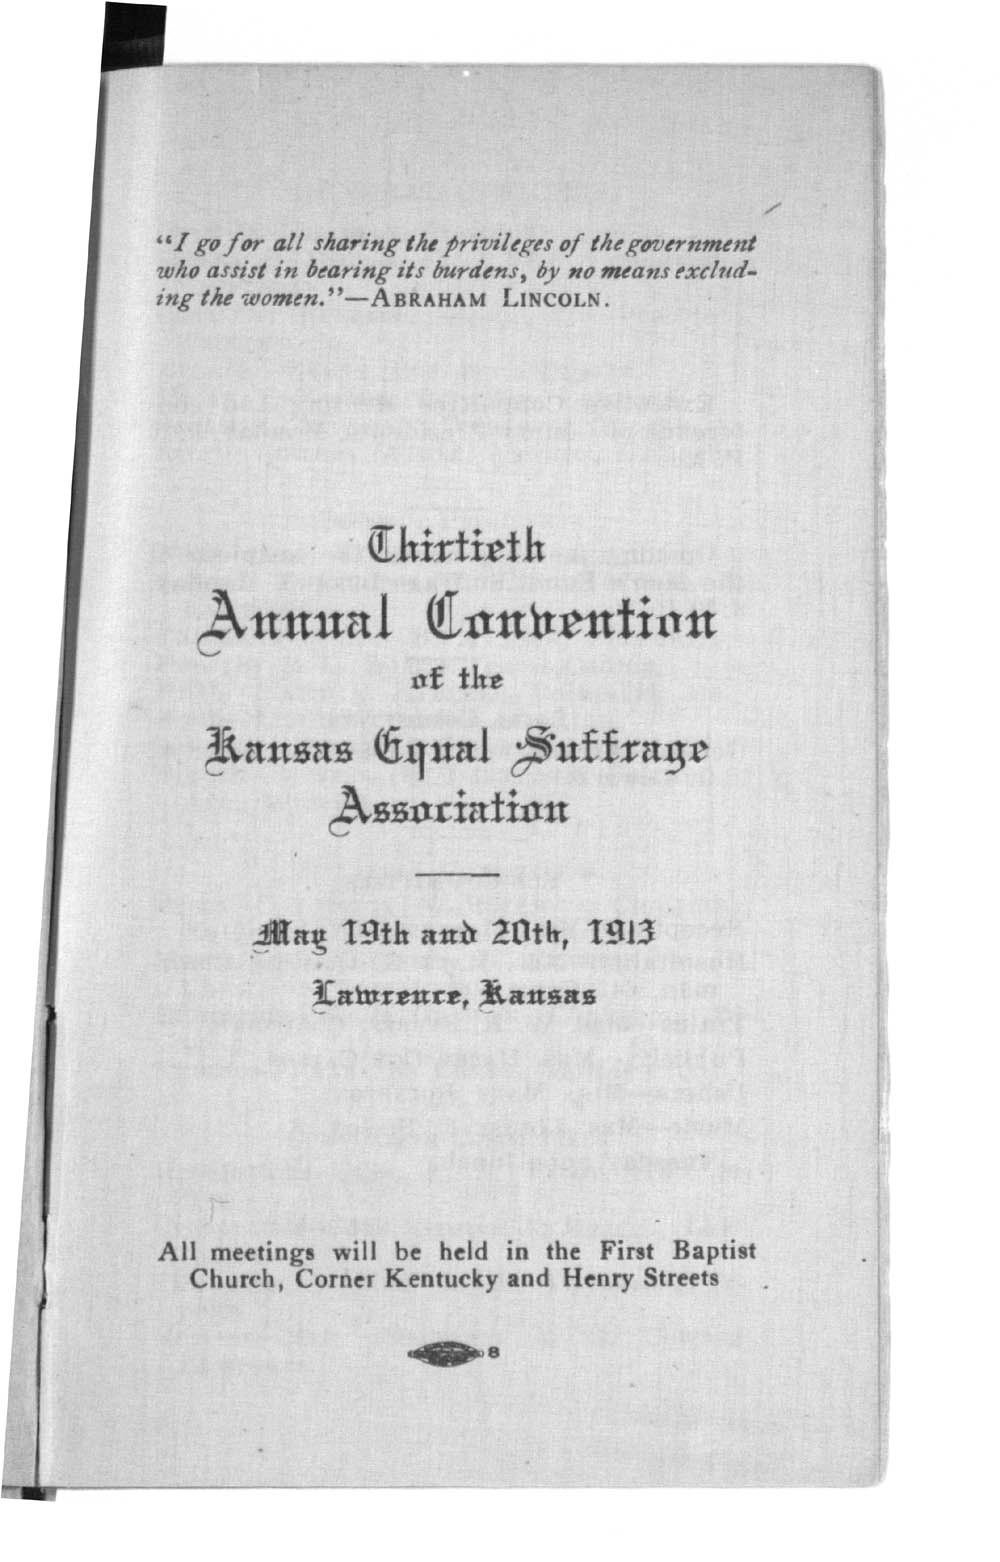 Kansas Equal Suffrage Association thirtieth annual convention - 2